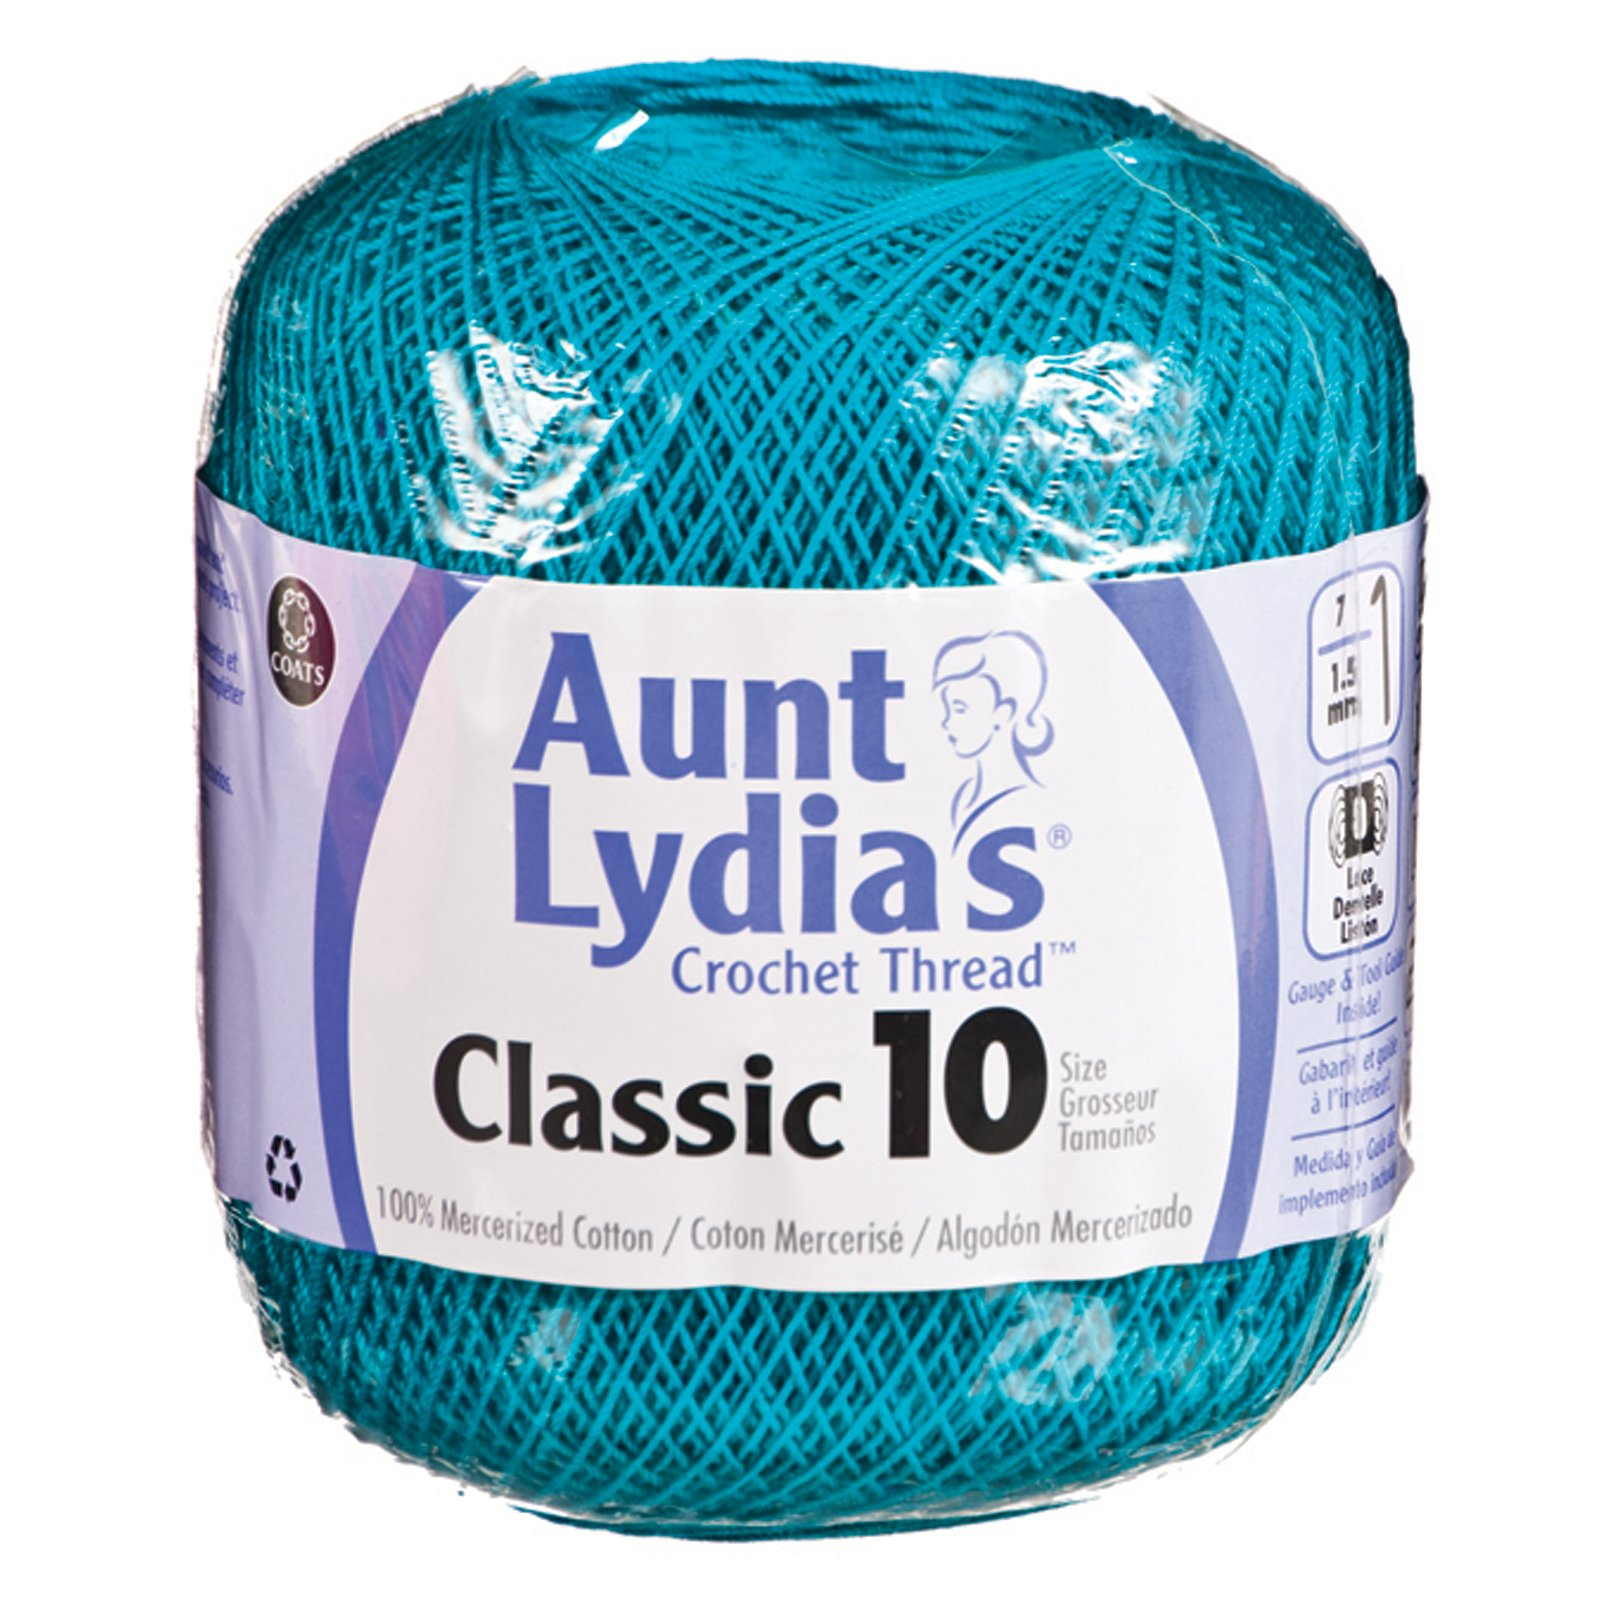 Cheap Size 3 Cotton Crochet Thread Find Size 3 Cotton Crochet